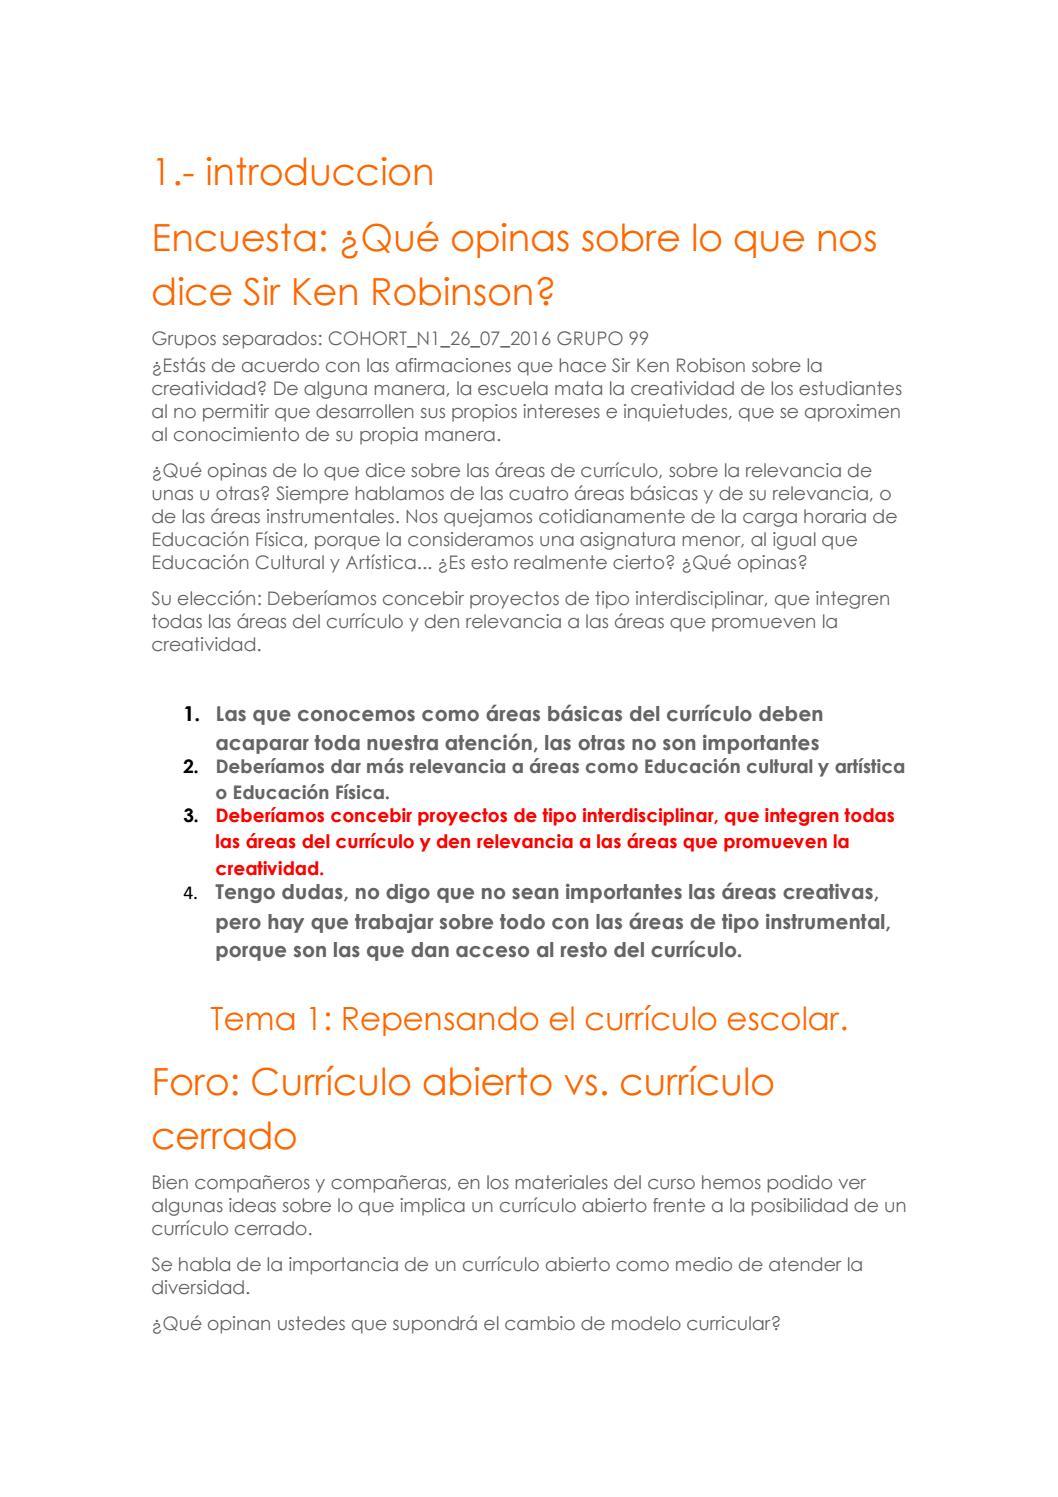 actualizacion curricular promo 14 by Adri Naranjo de Márquez - issuu